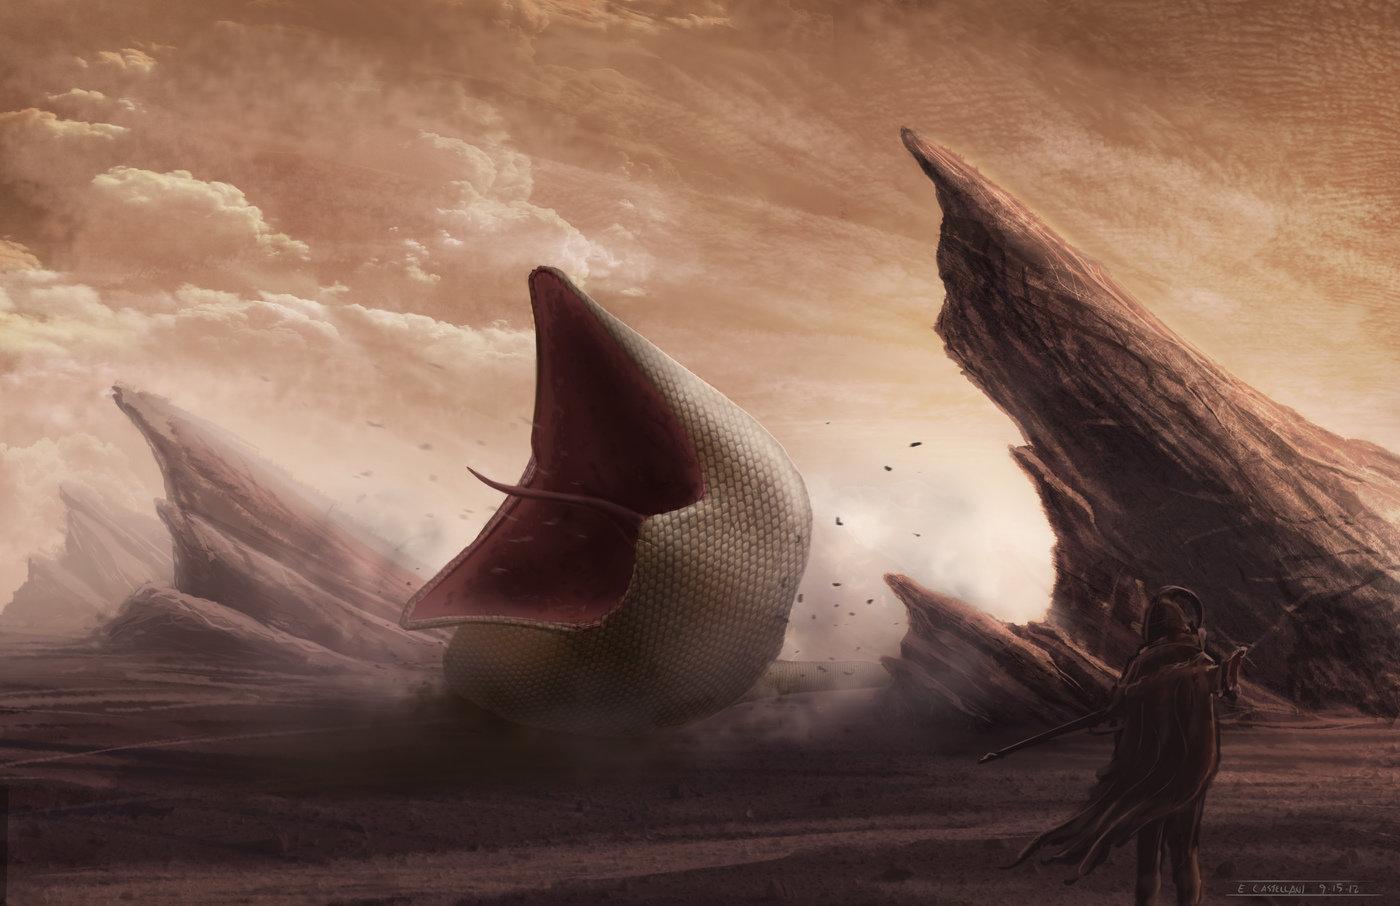 concept art by enzo castellani at coroflot com